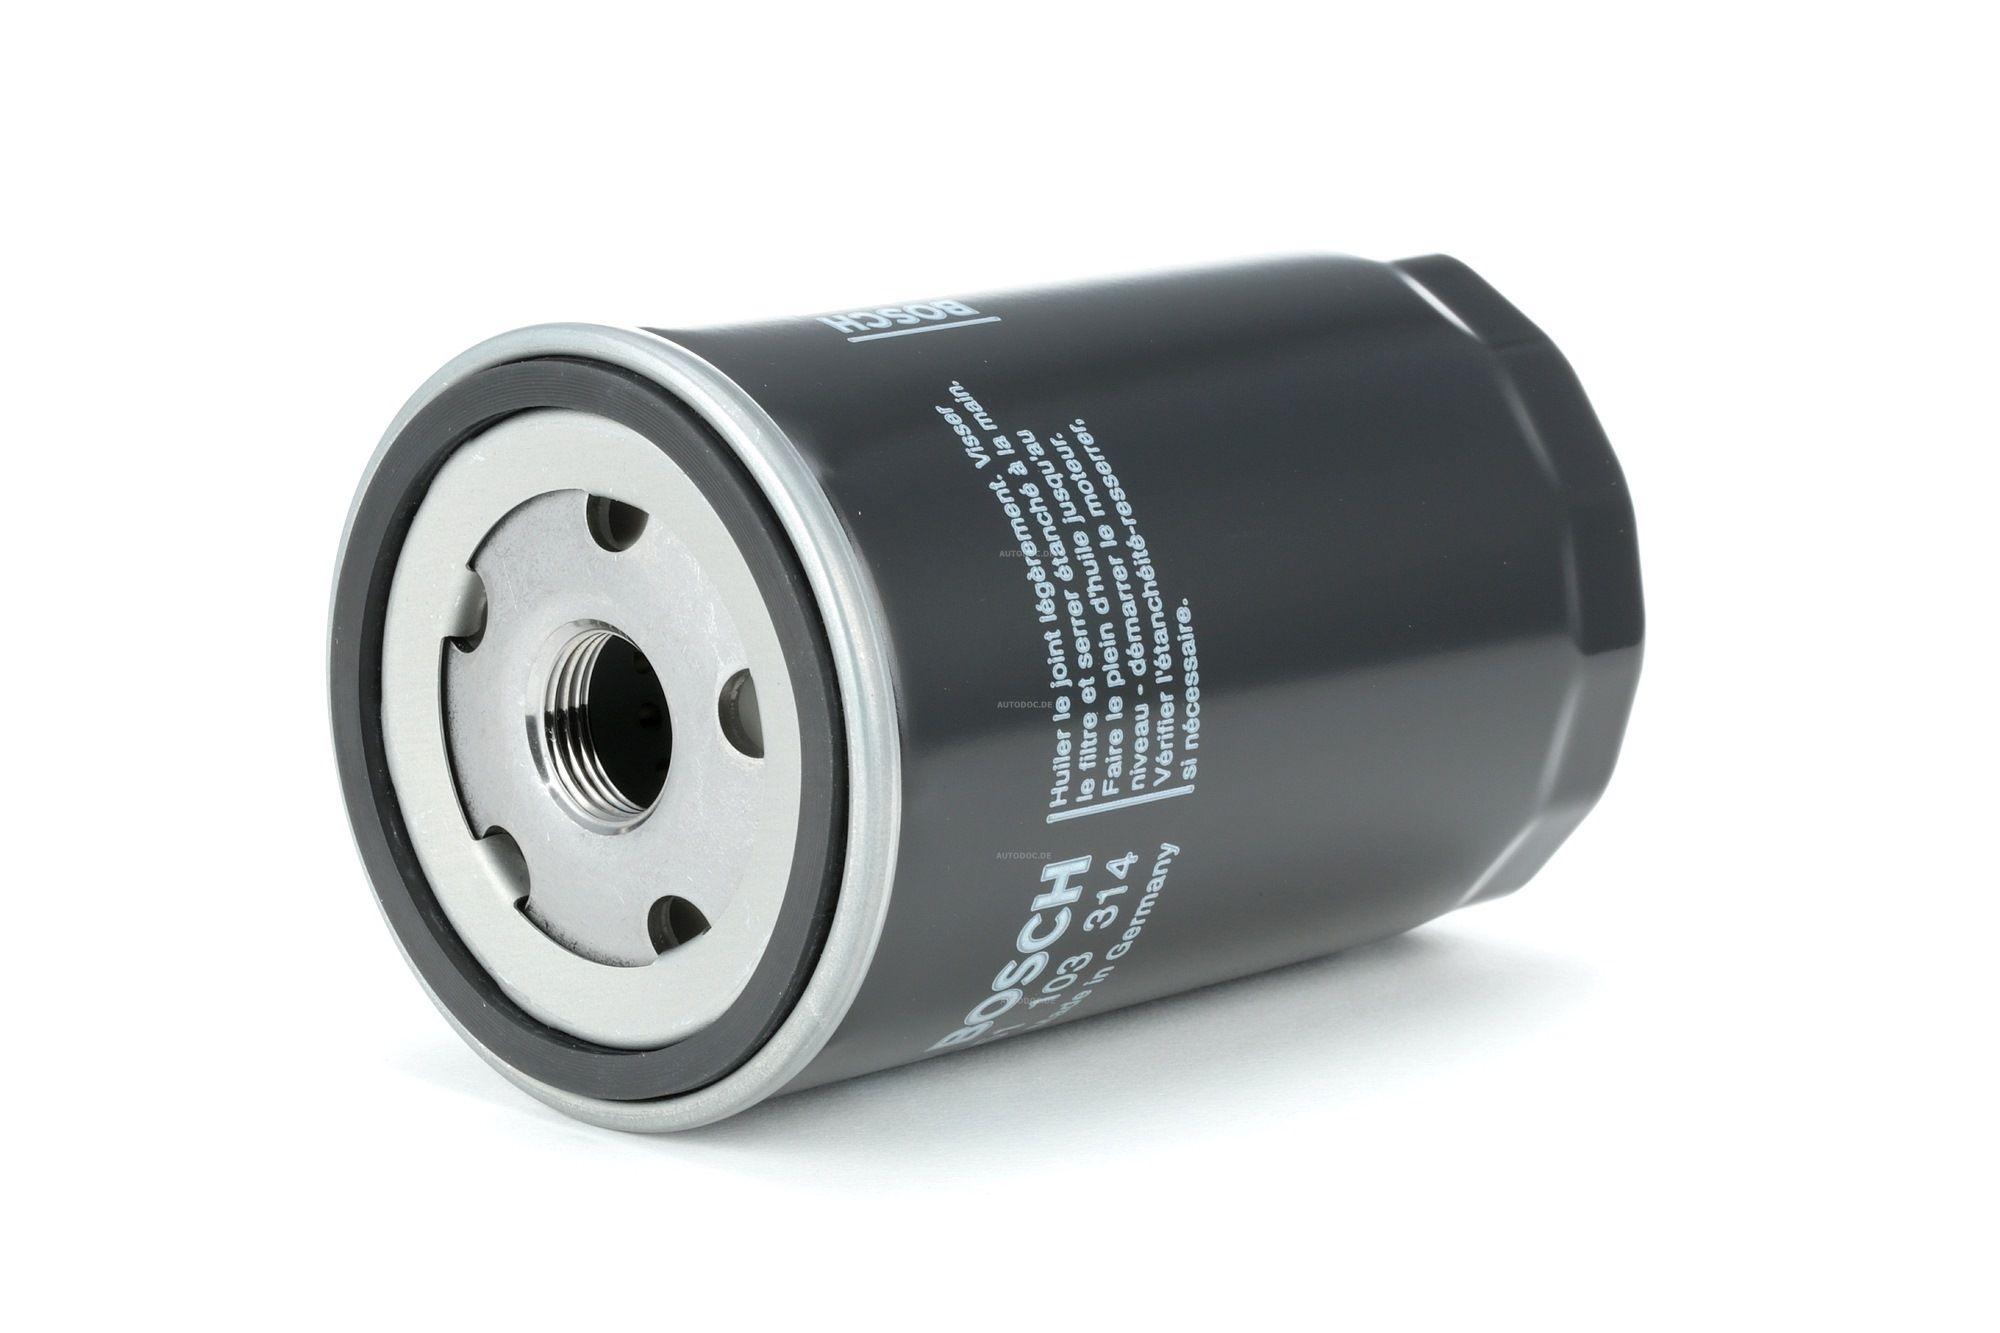 P3314 BOSCH Anschraubfilter Ø: 76,1mm, Höhe: 124mm Ölfilter 0 451 103 314 günstig kaufen